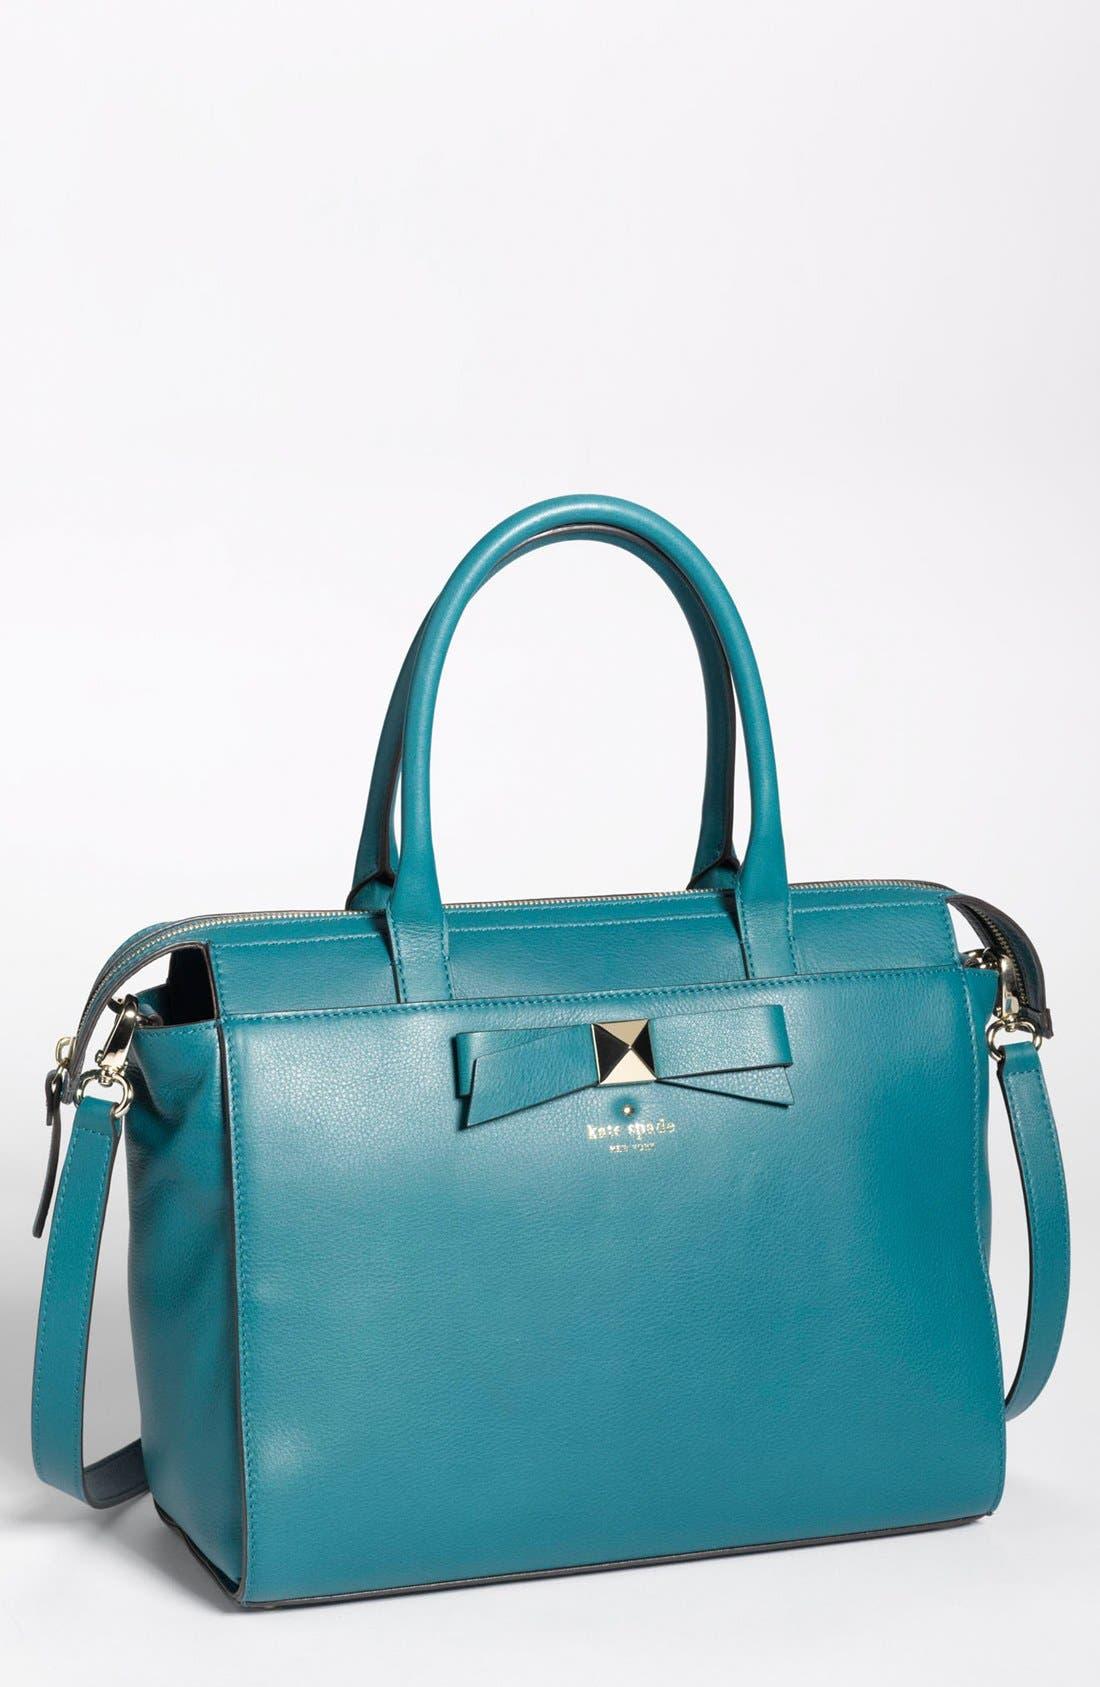 Alternate Image 1 Selected - kate spade new york 'hancock park - jeanne' leather satchel, medium